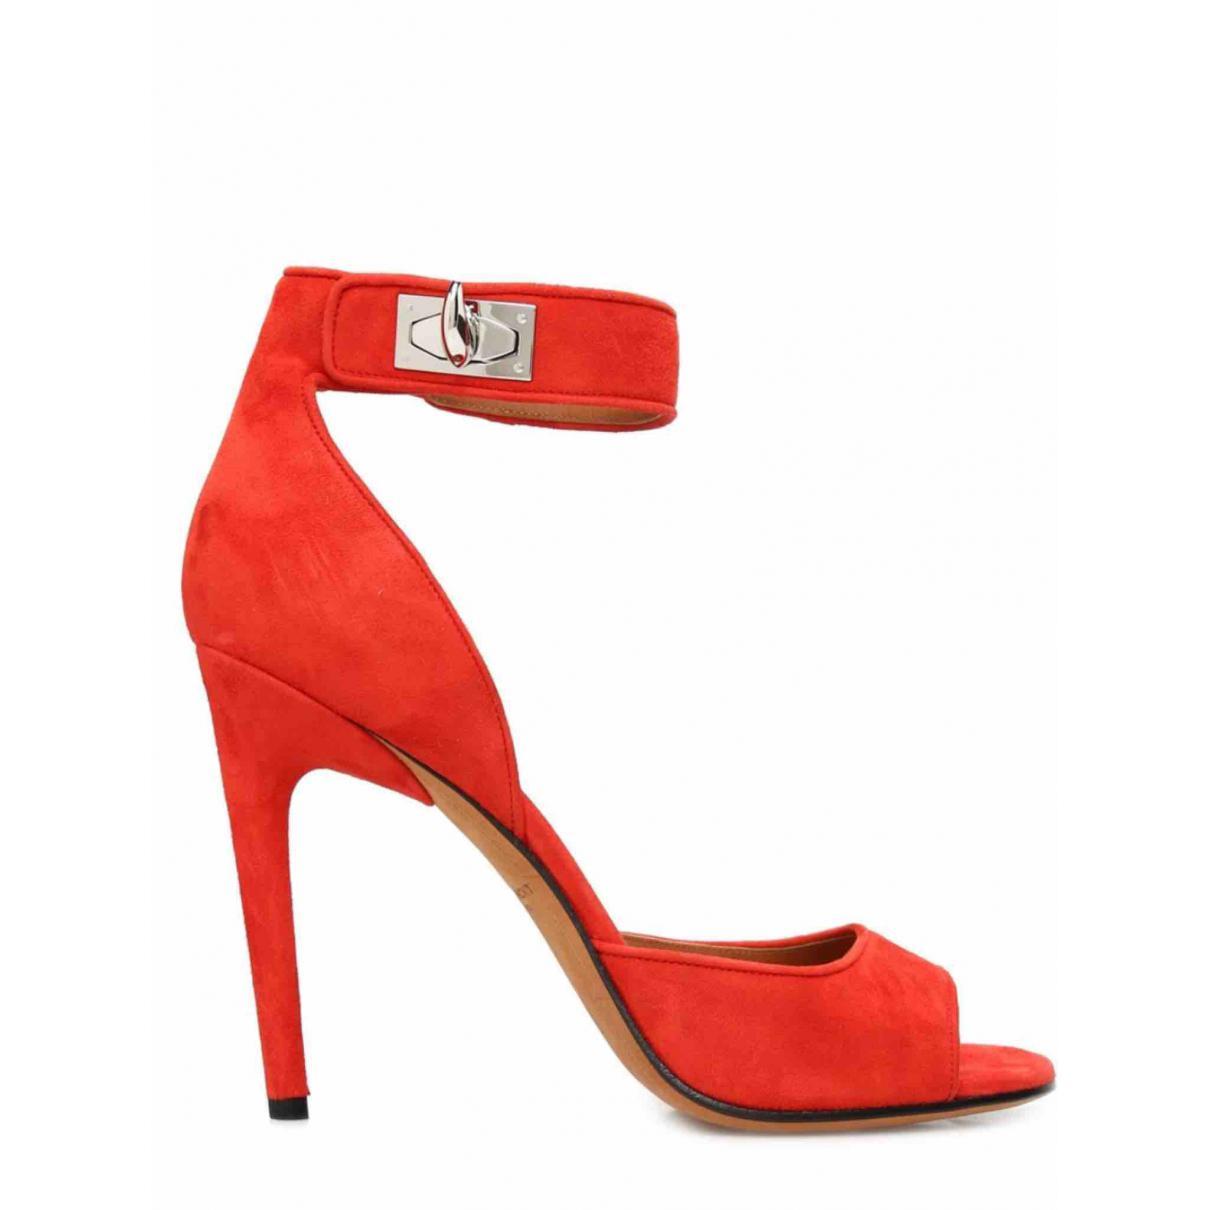 Fashion stylist course online 39